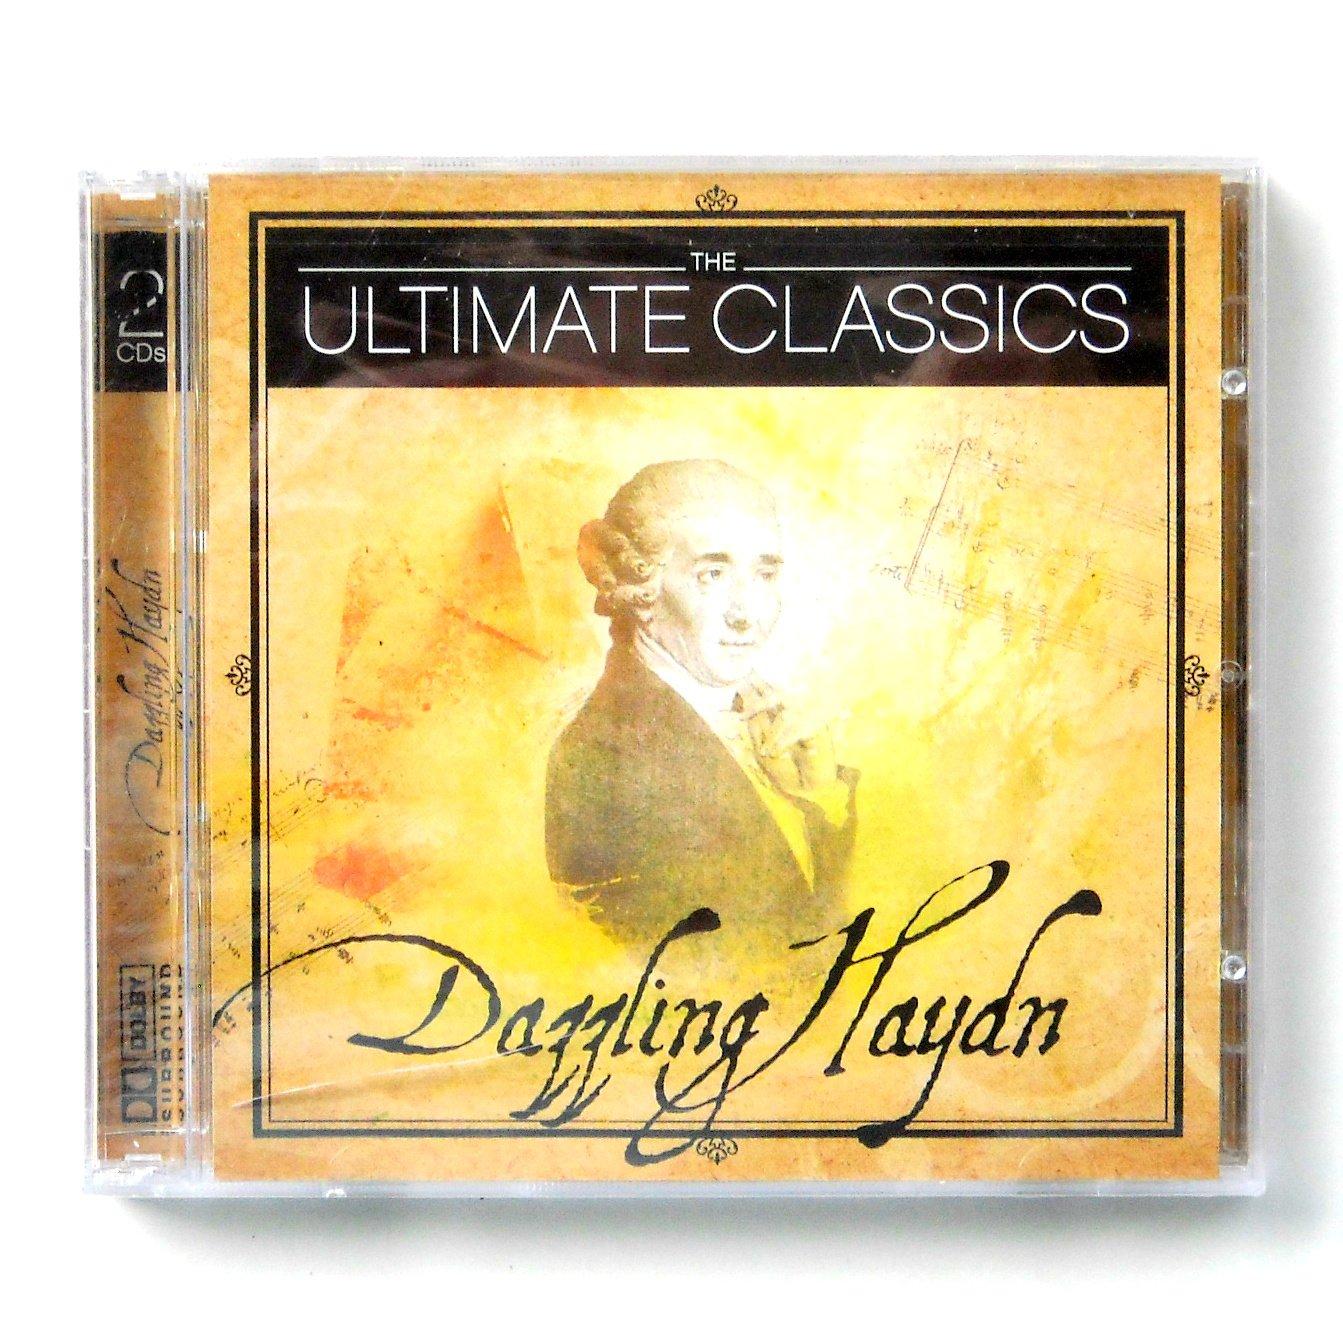 The Ultimate Classics Dazzling Haydn 2 CD Set